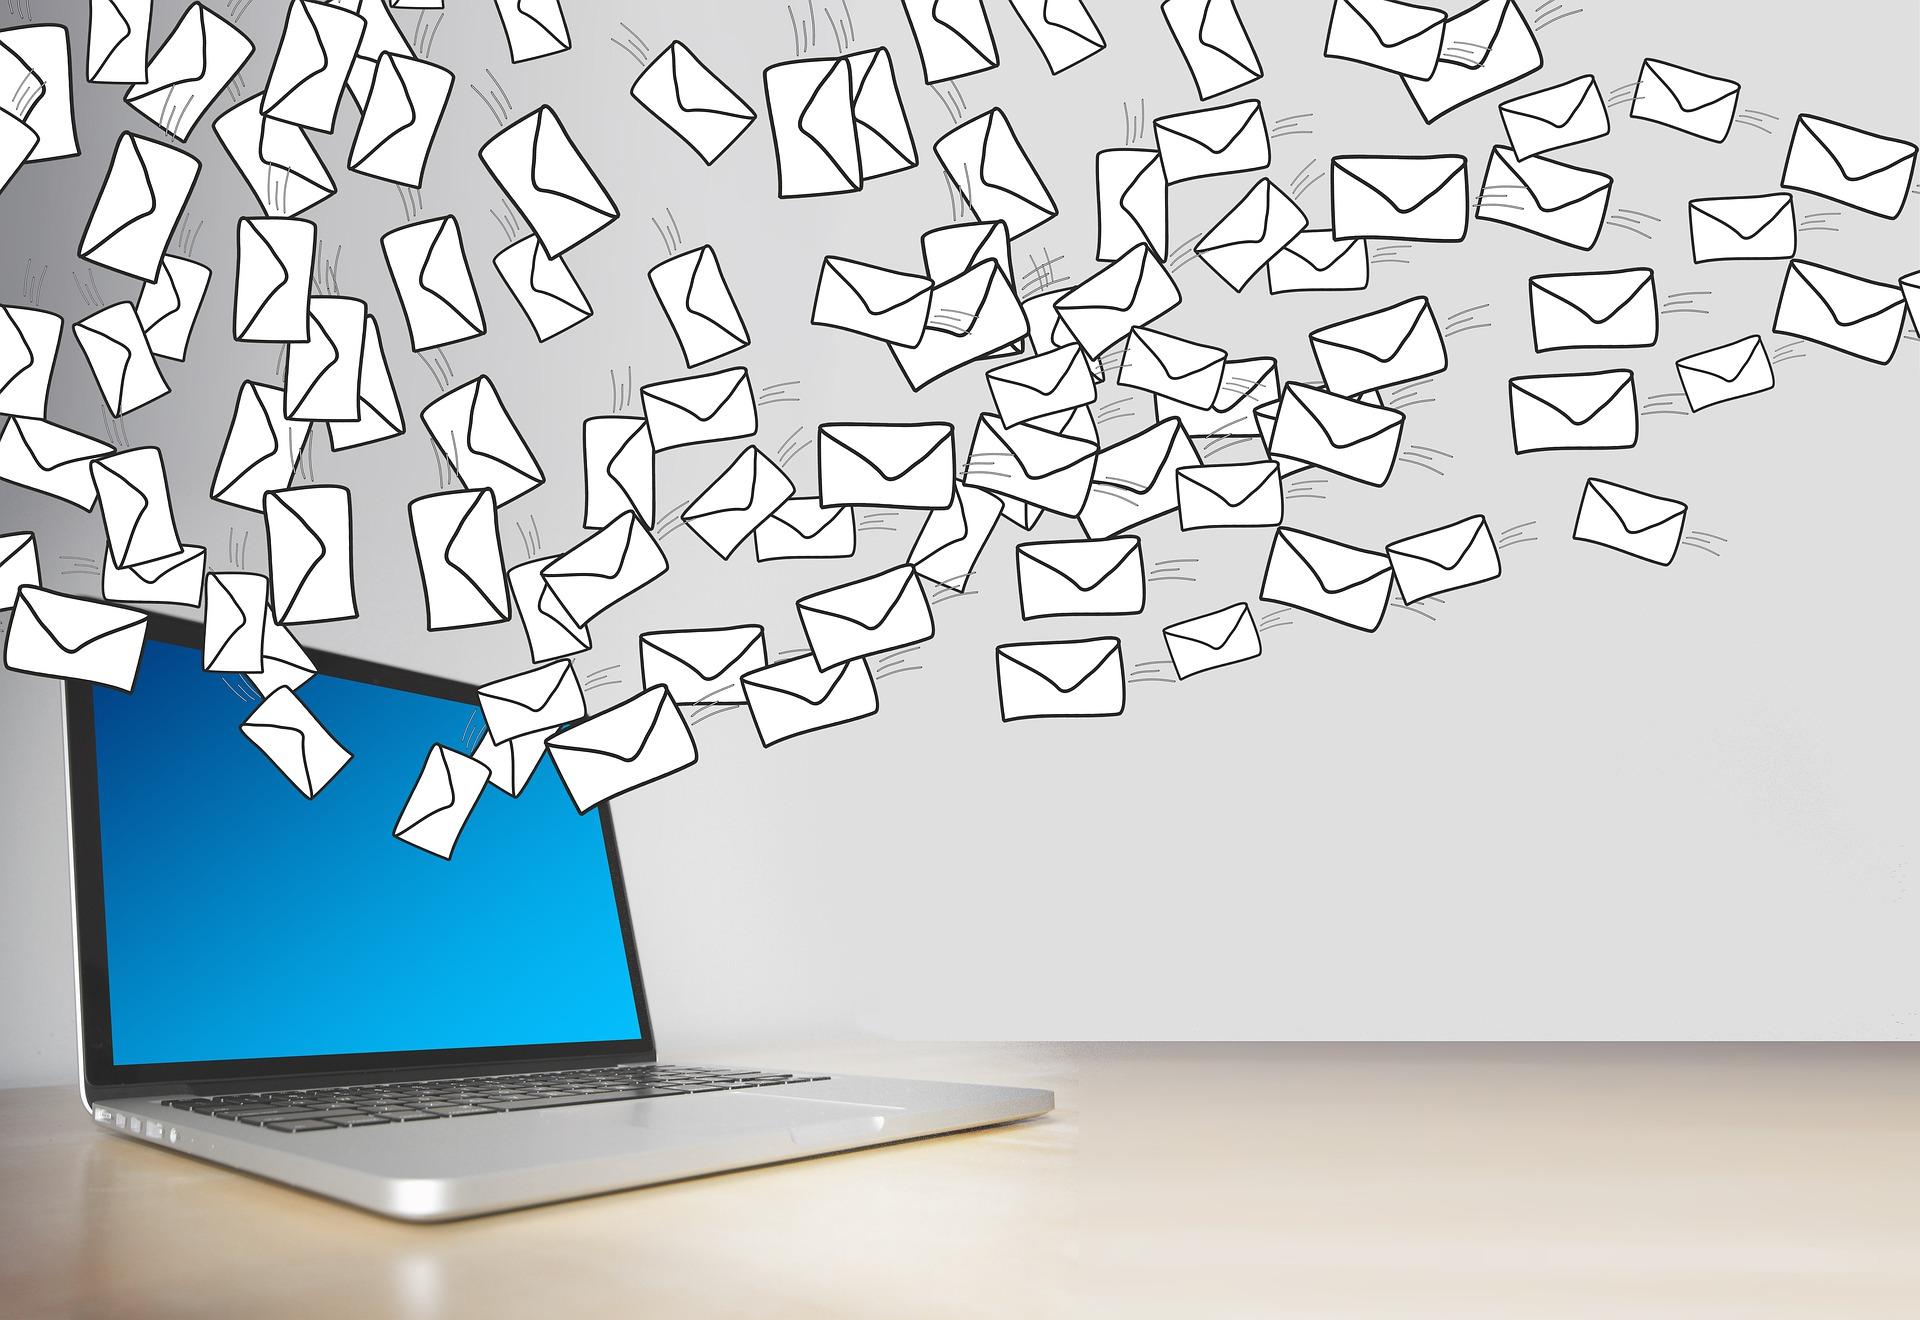 Illustration - a laptop releasing many envelopes